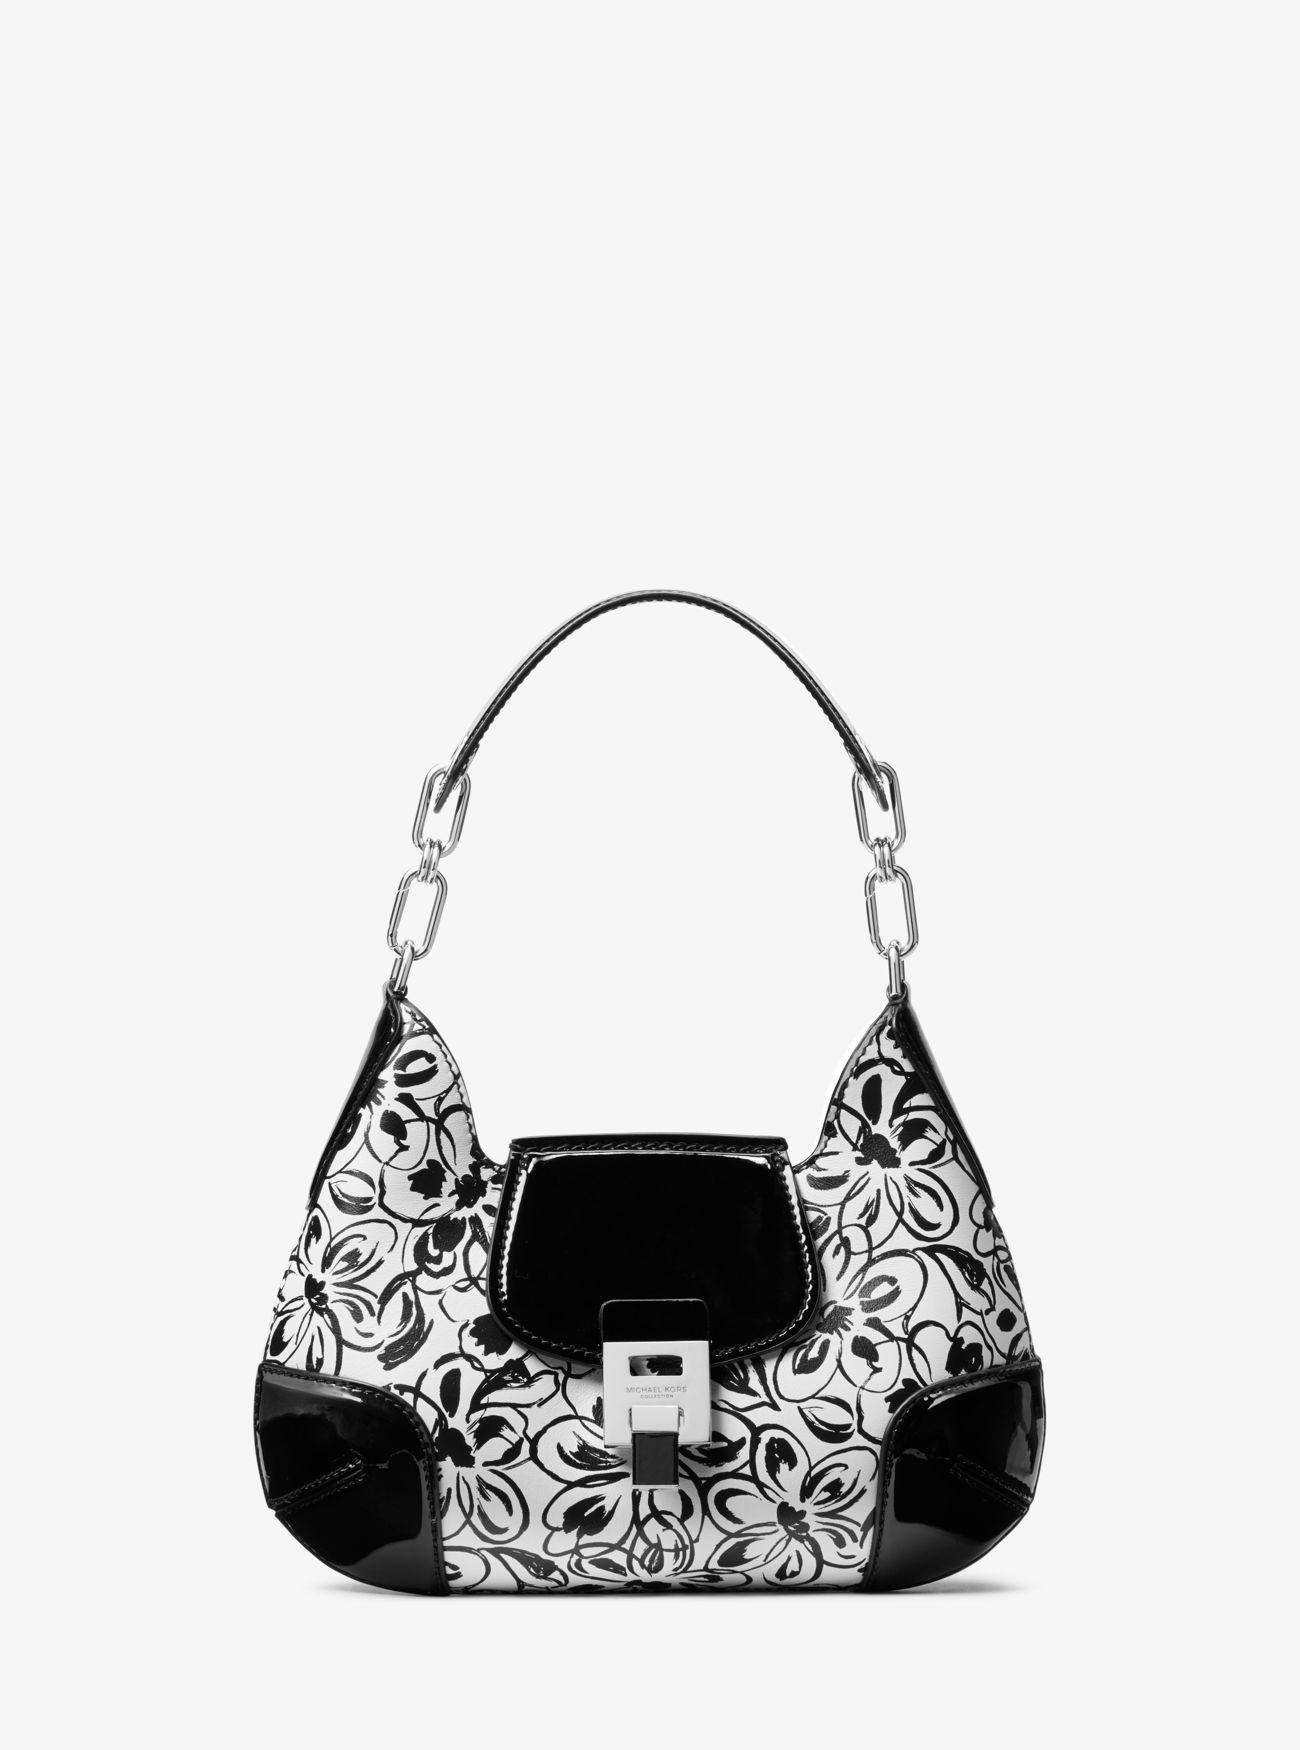 f47b761c0eb80f Michael Kors. Women's Black Bancroft Small Painterly Floral Calf Leather  Shoulder Bag